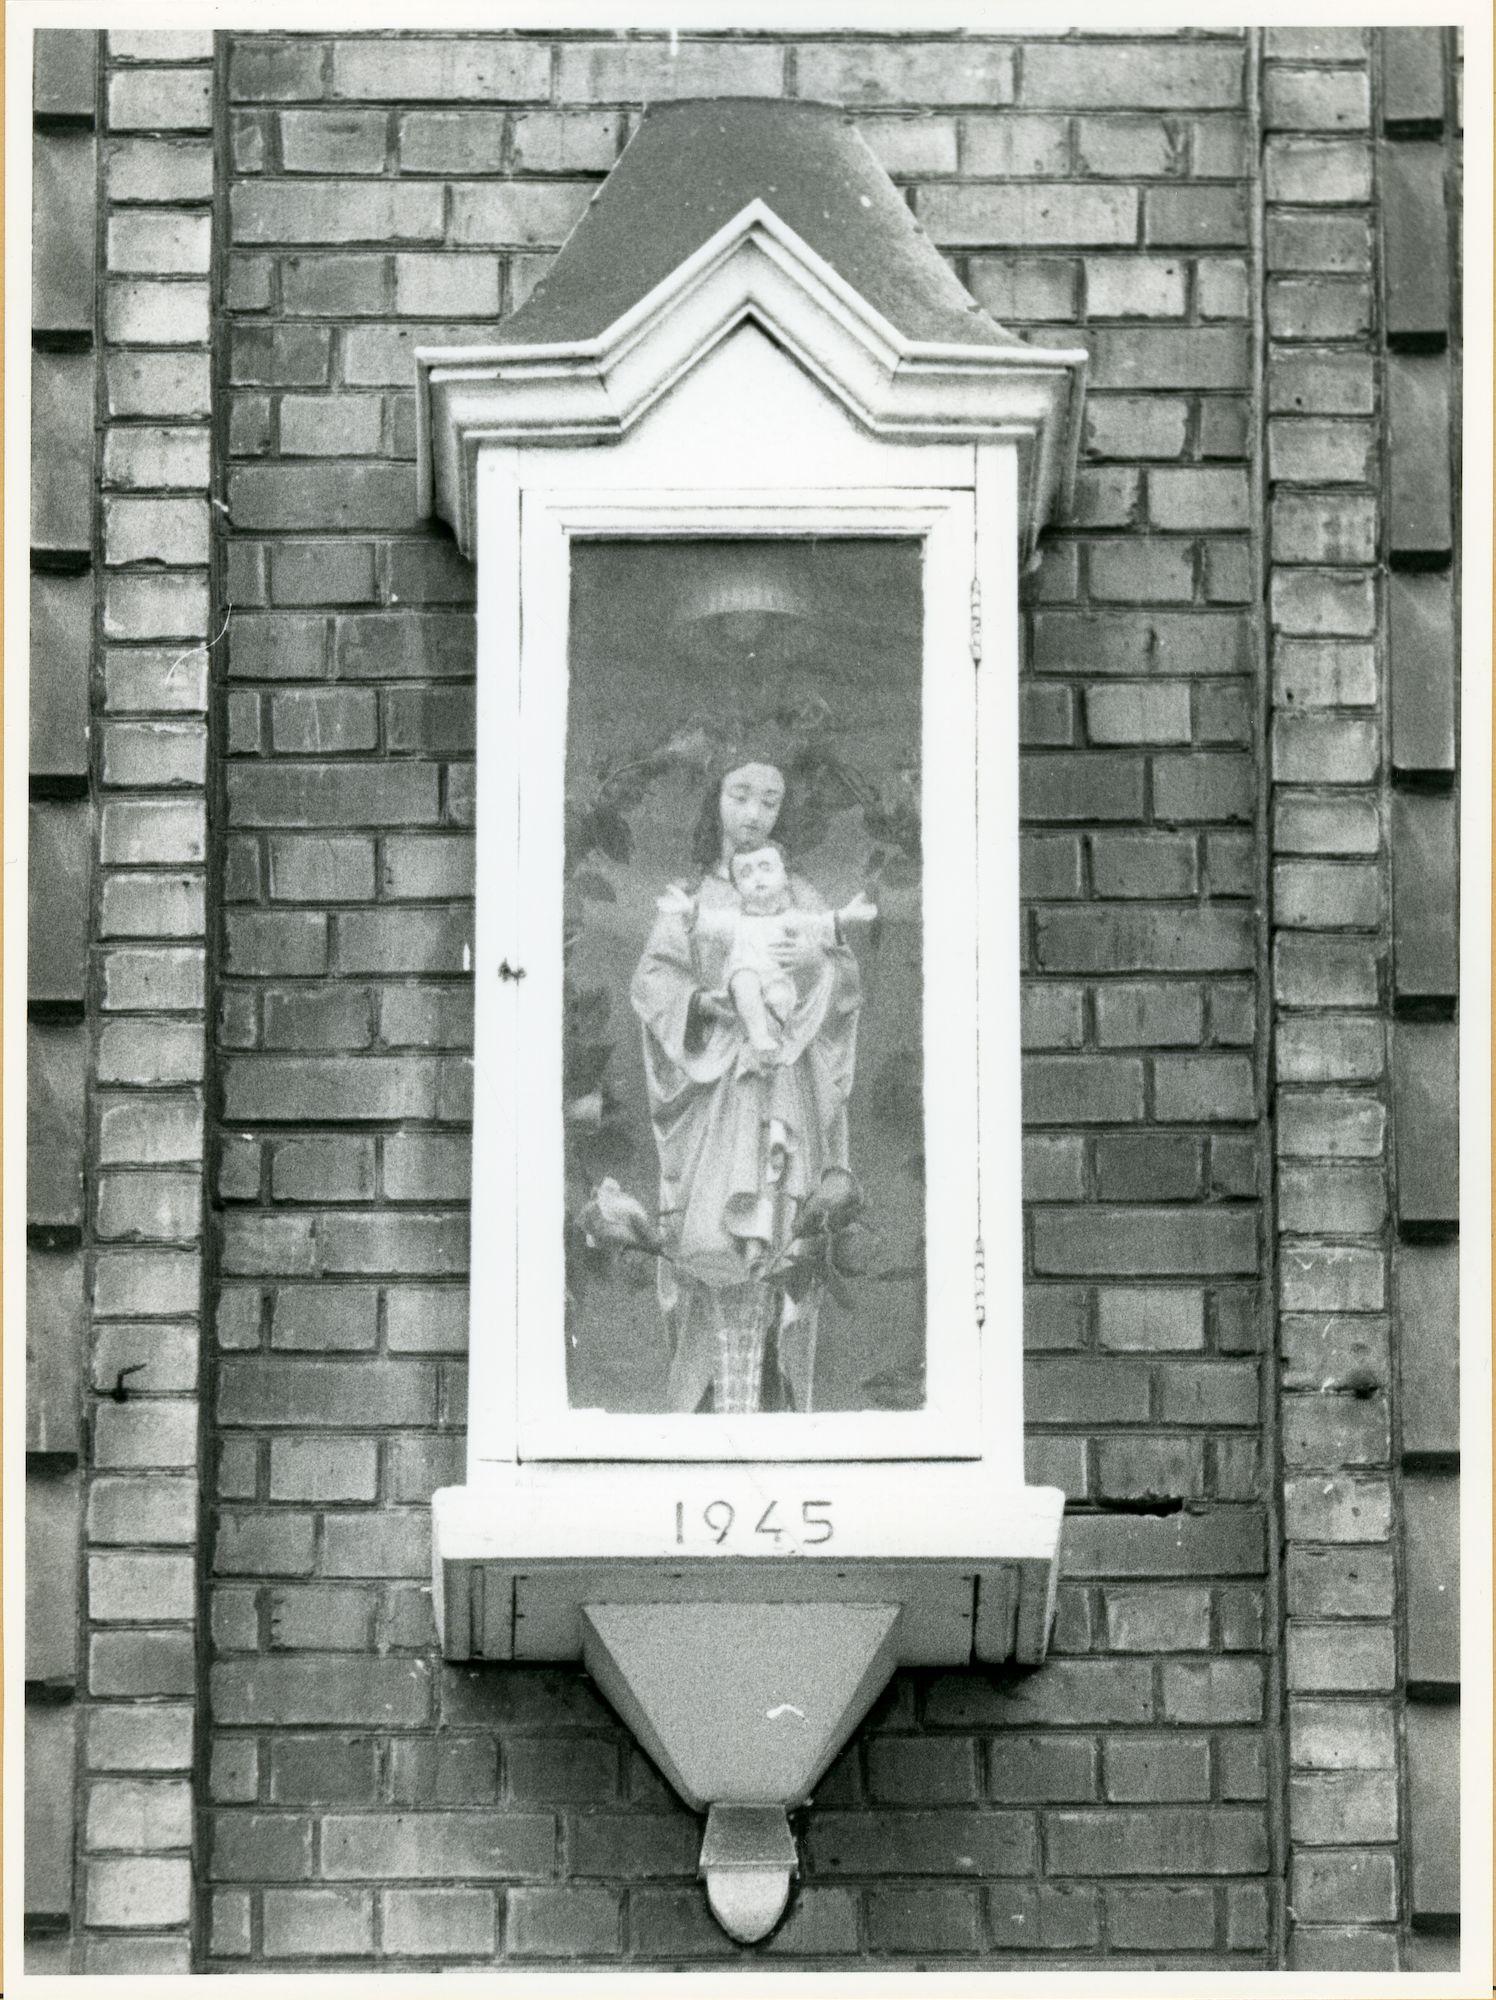 Gent: Ottergemsesteenweg 228: Gevelkapel, 1979